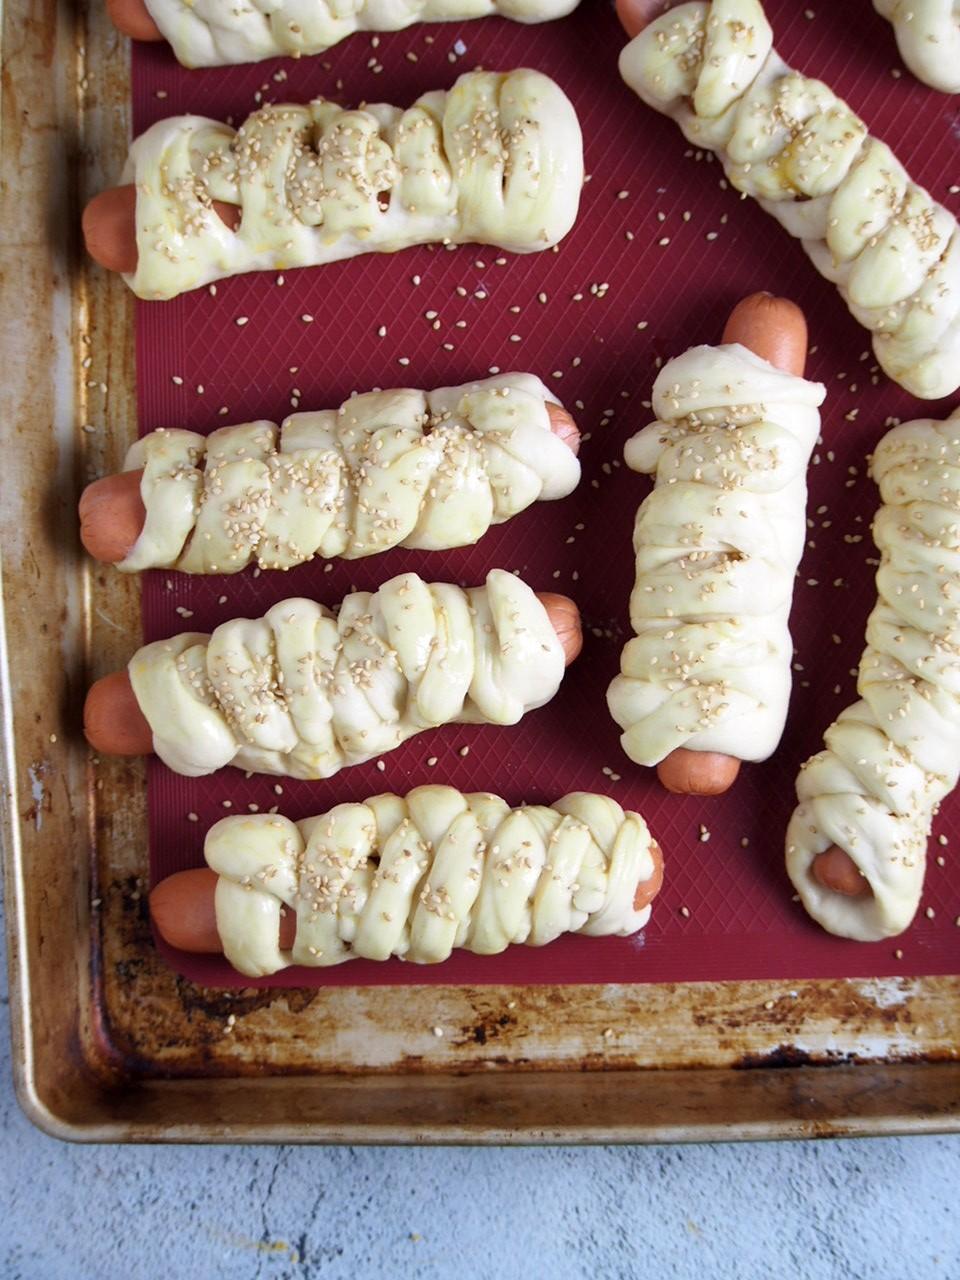 Braided hotdog buns ready for baking.